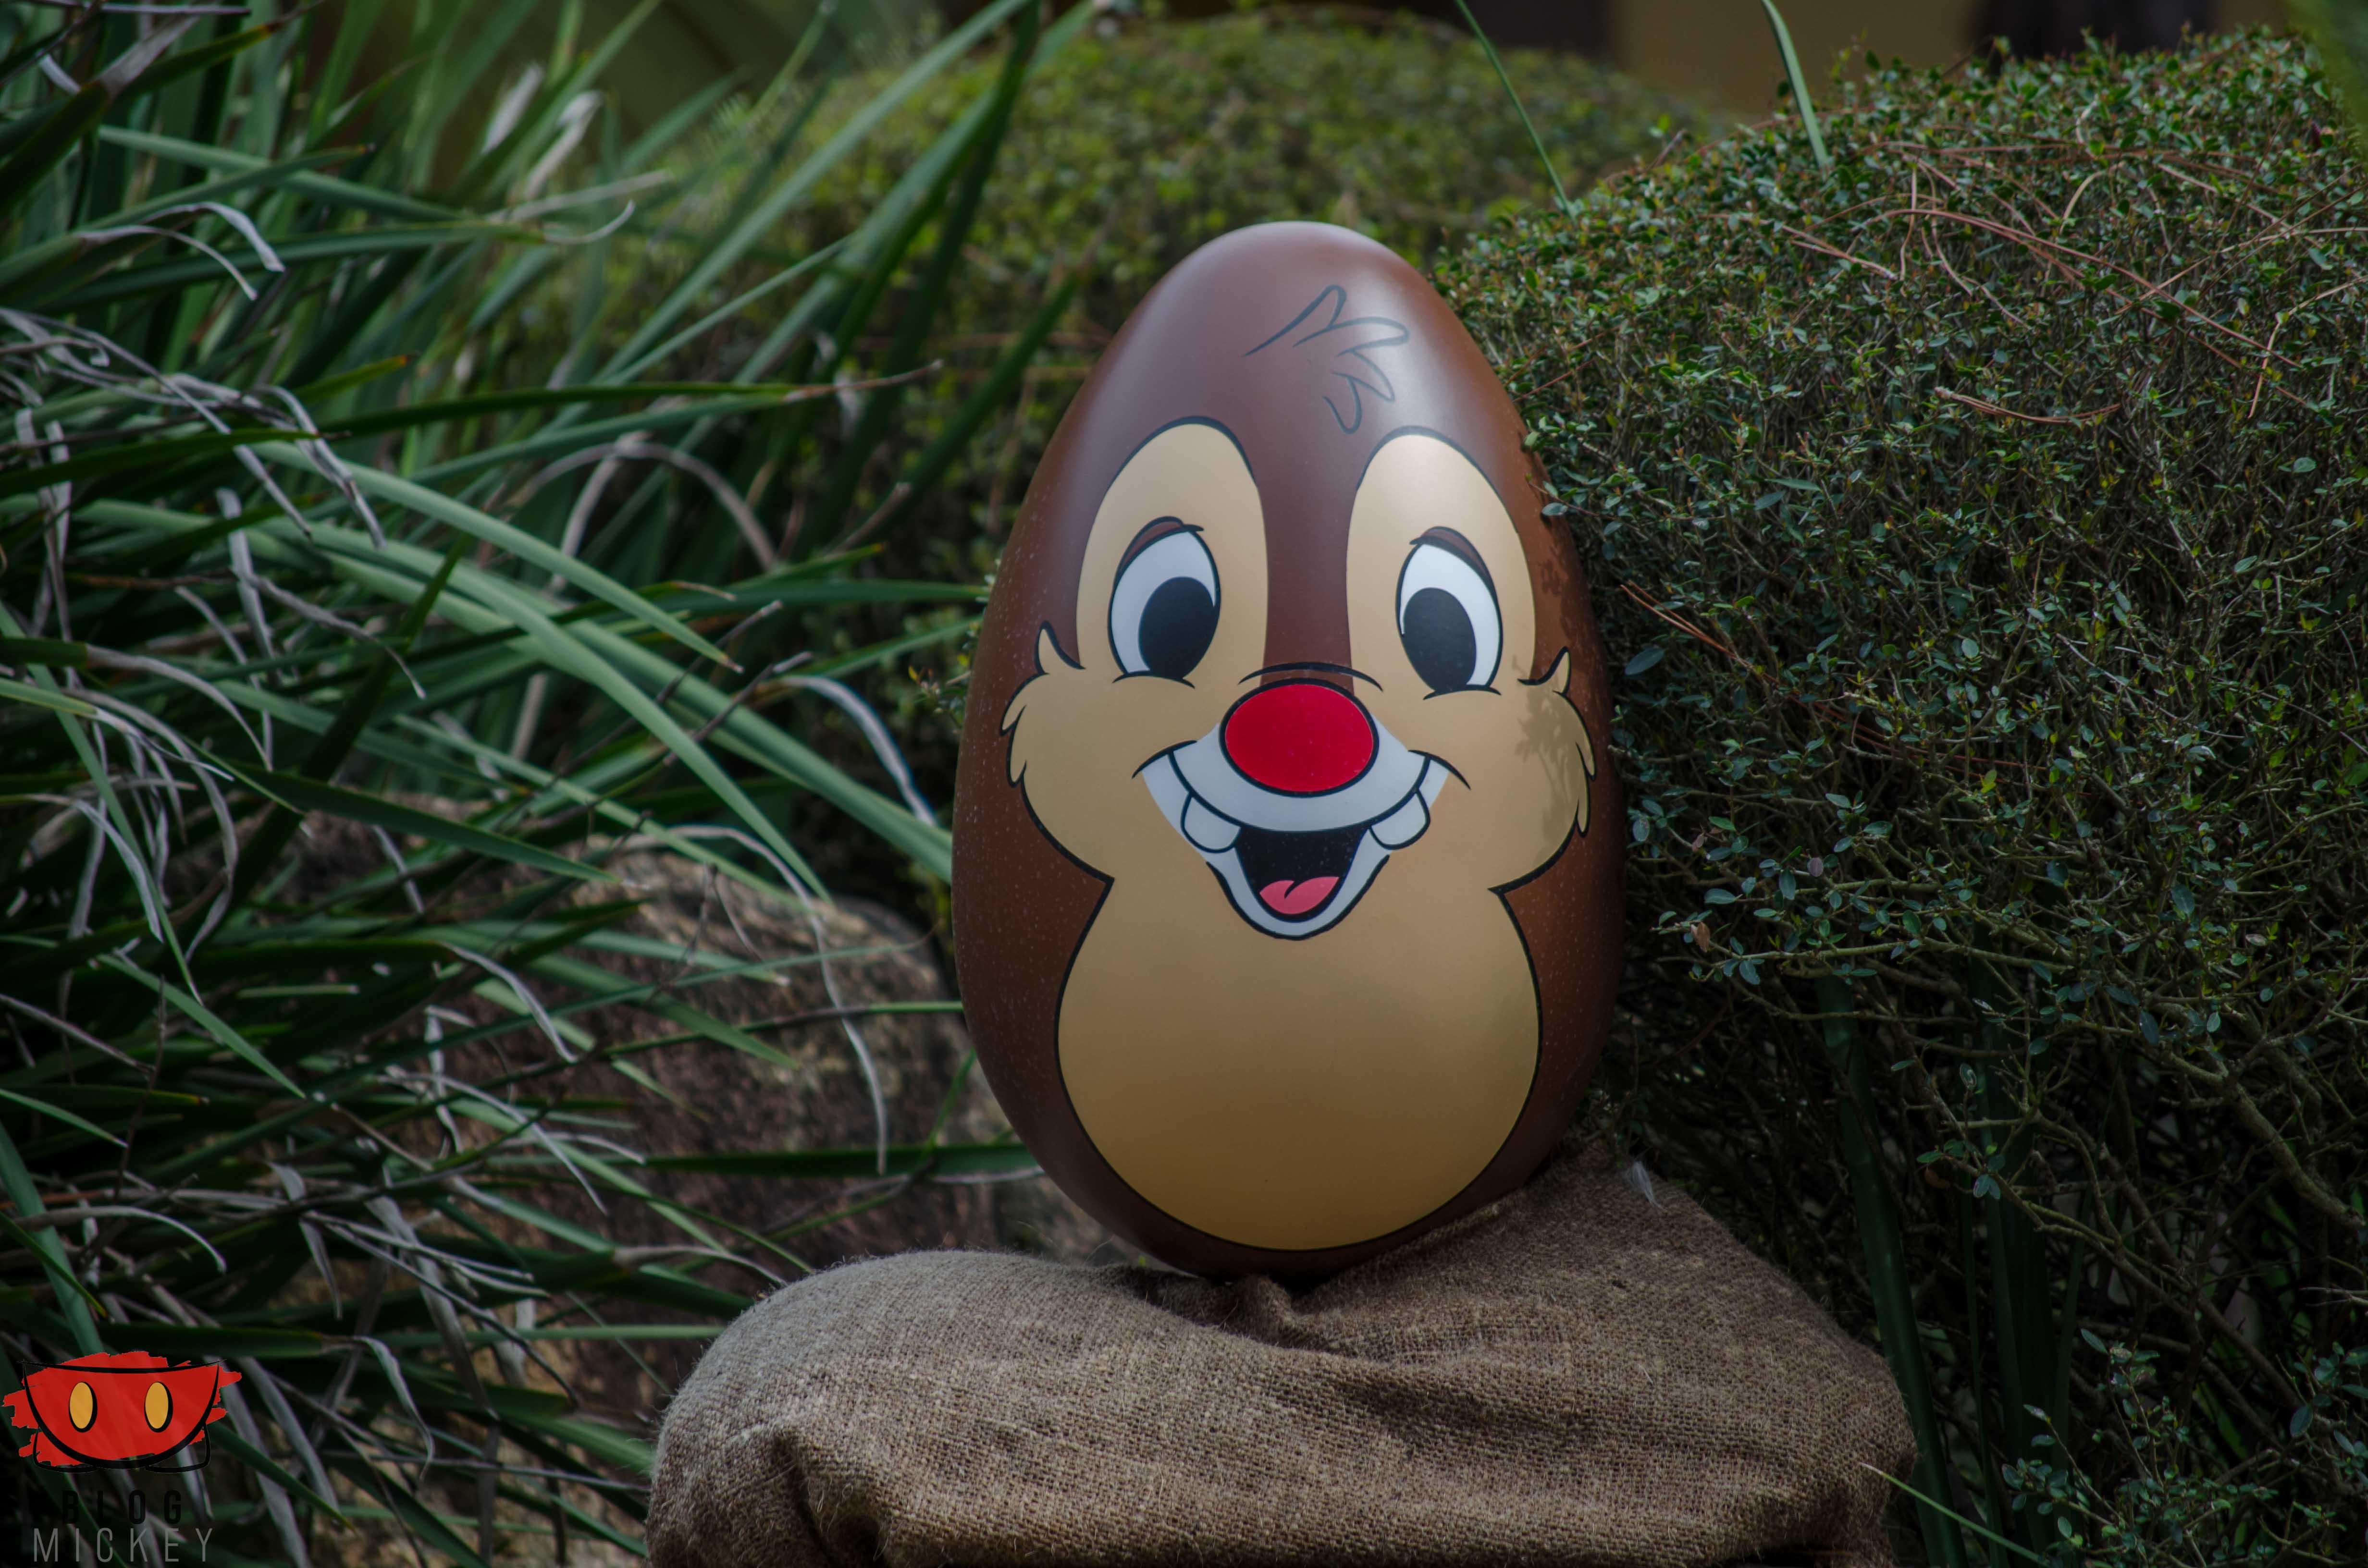 Eggstravaganza_03192016-17